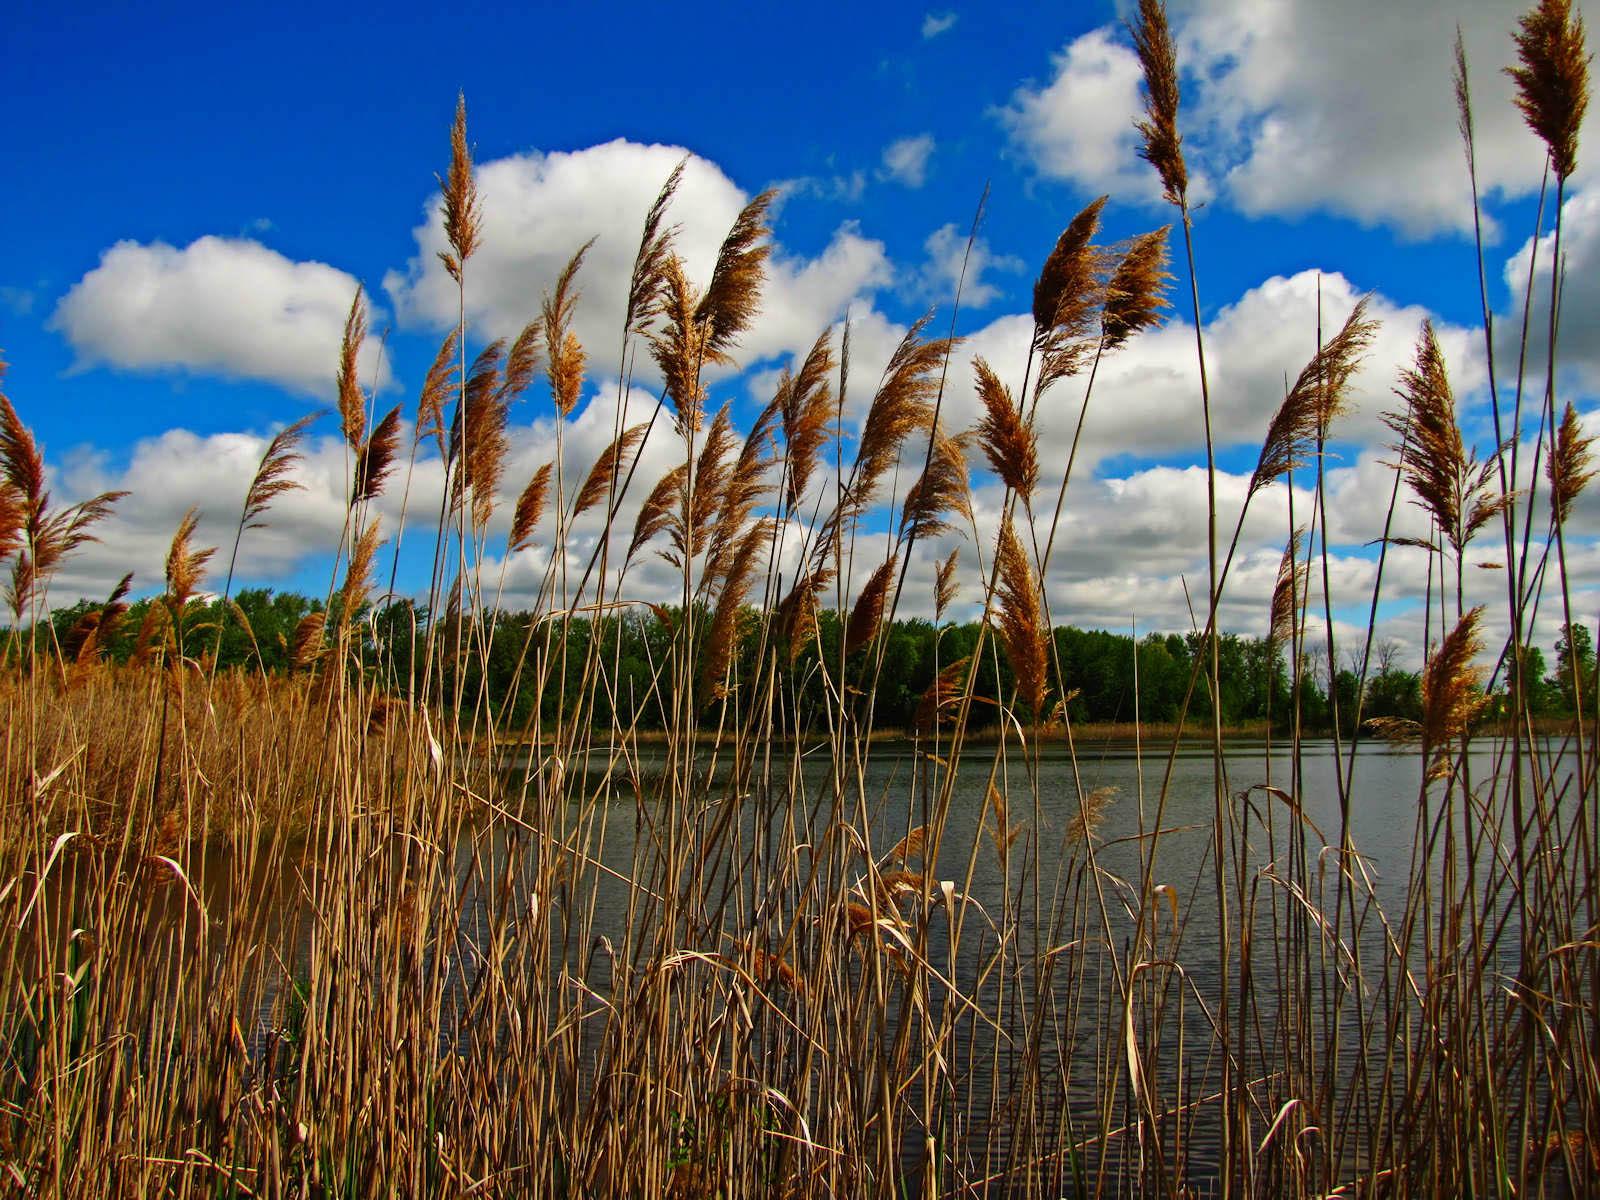 Gambar-Gambar Rumput yang Tinggi | wallpaper